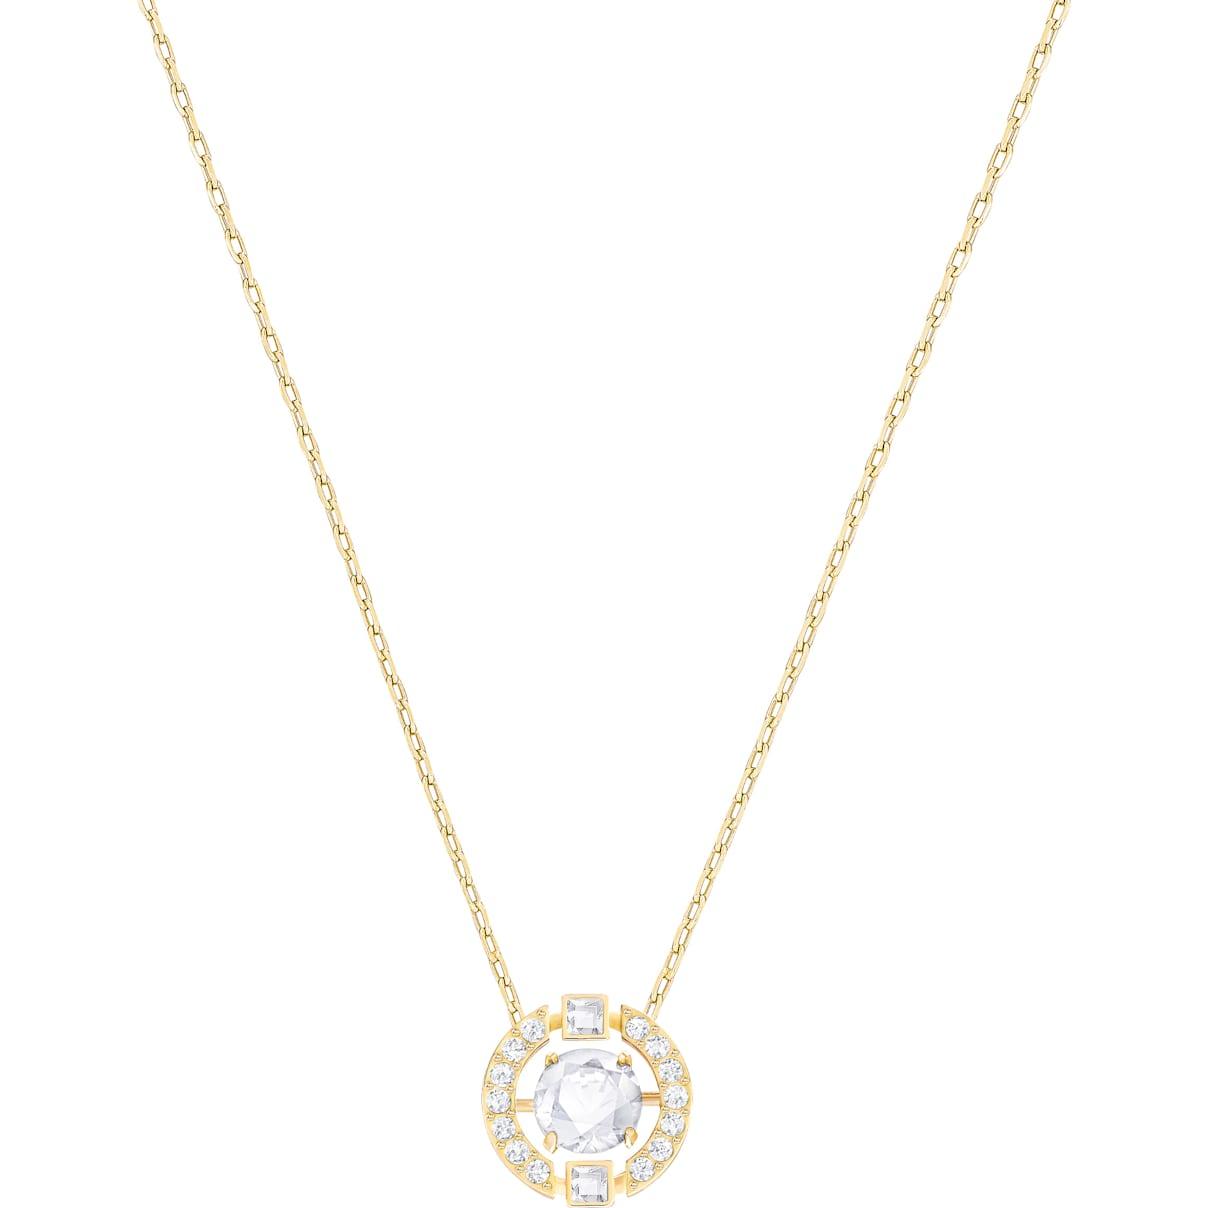 Swarovski Swarovski Sparkling Dance Round Necklace, White, Gold-tone plated